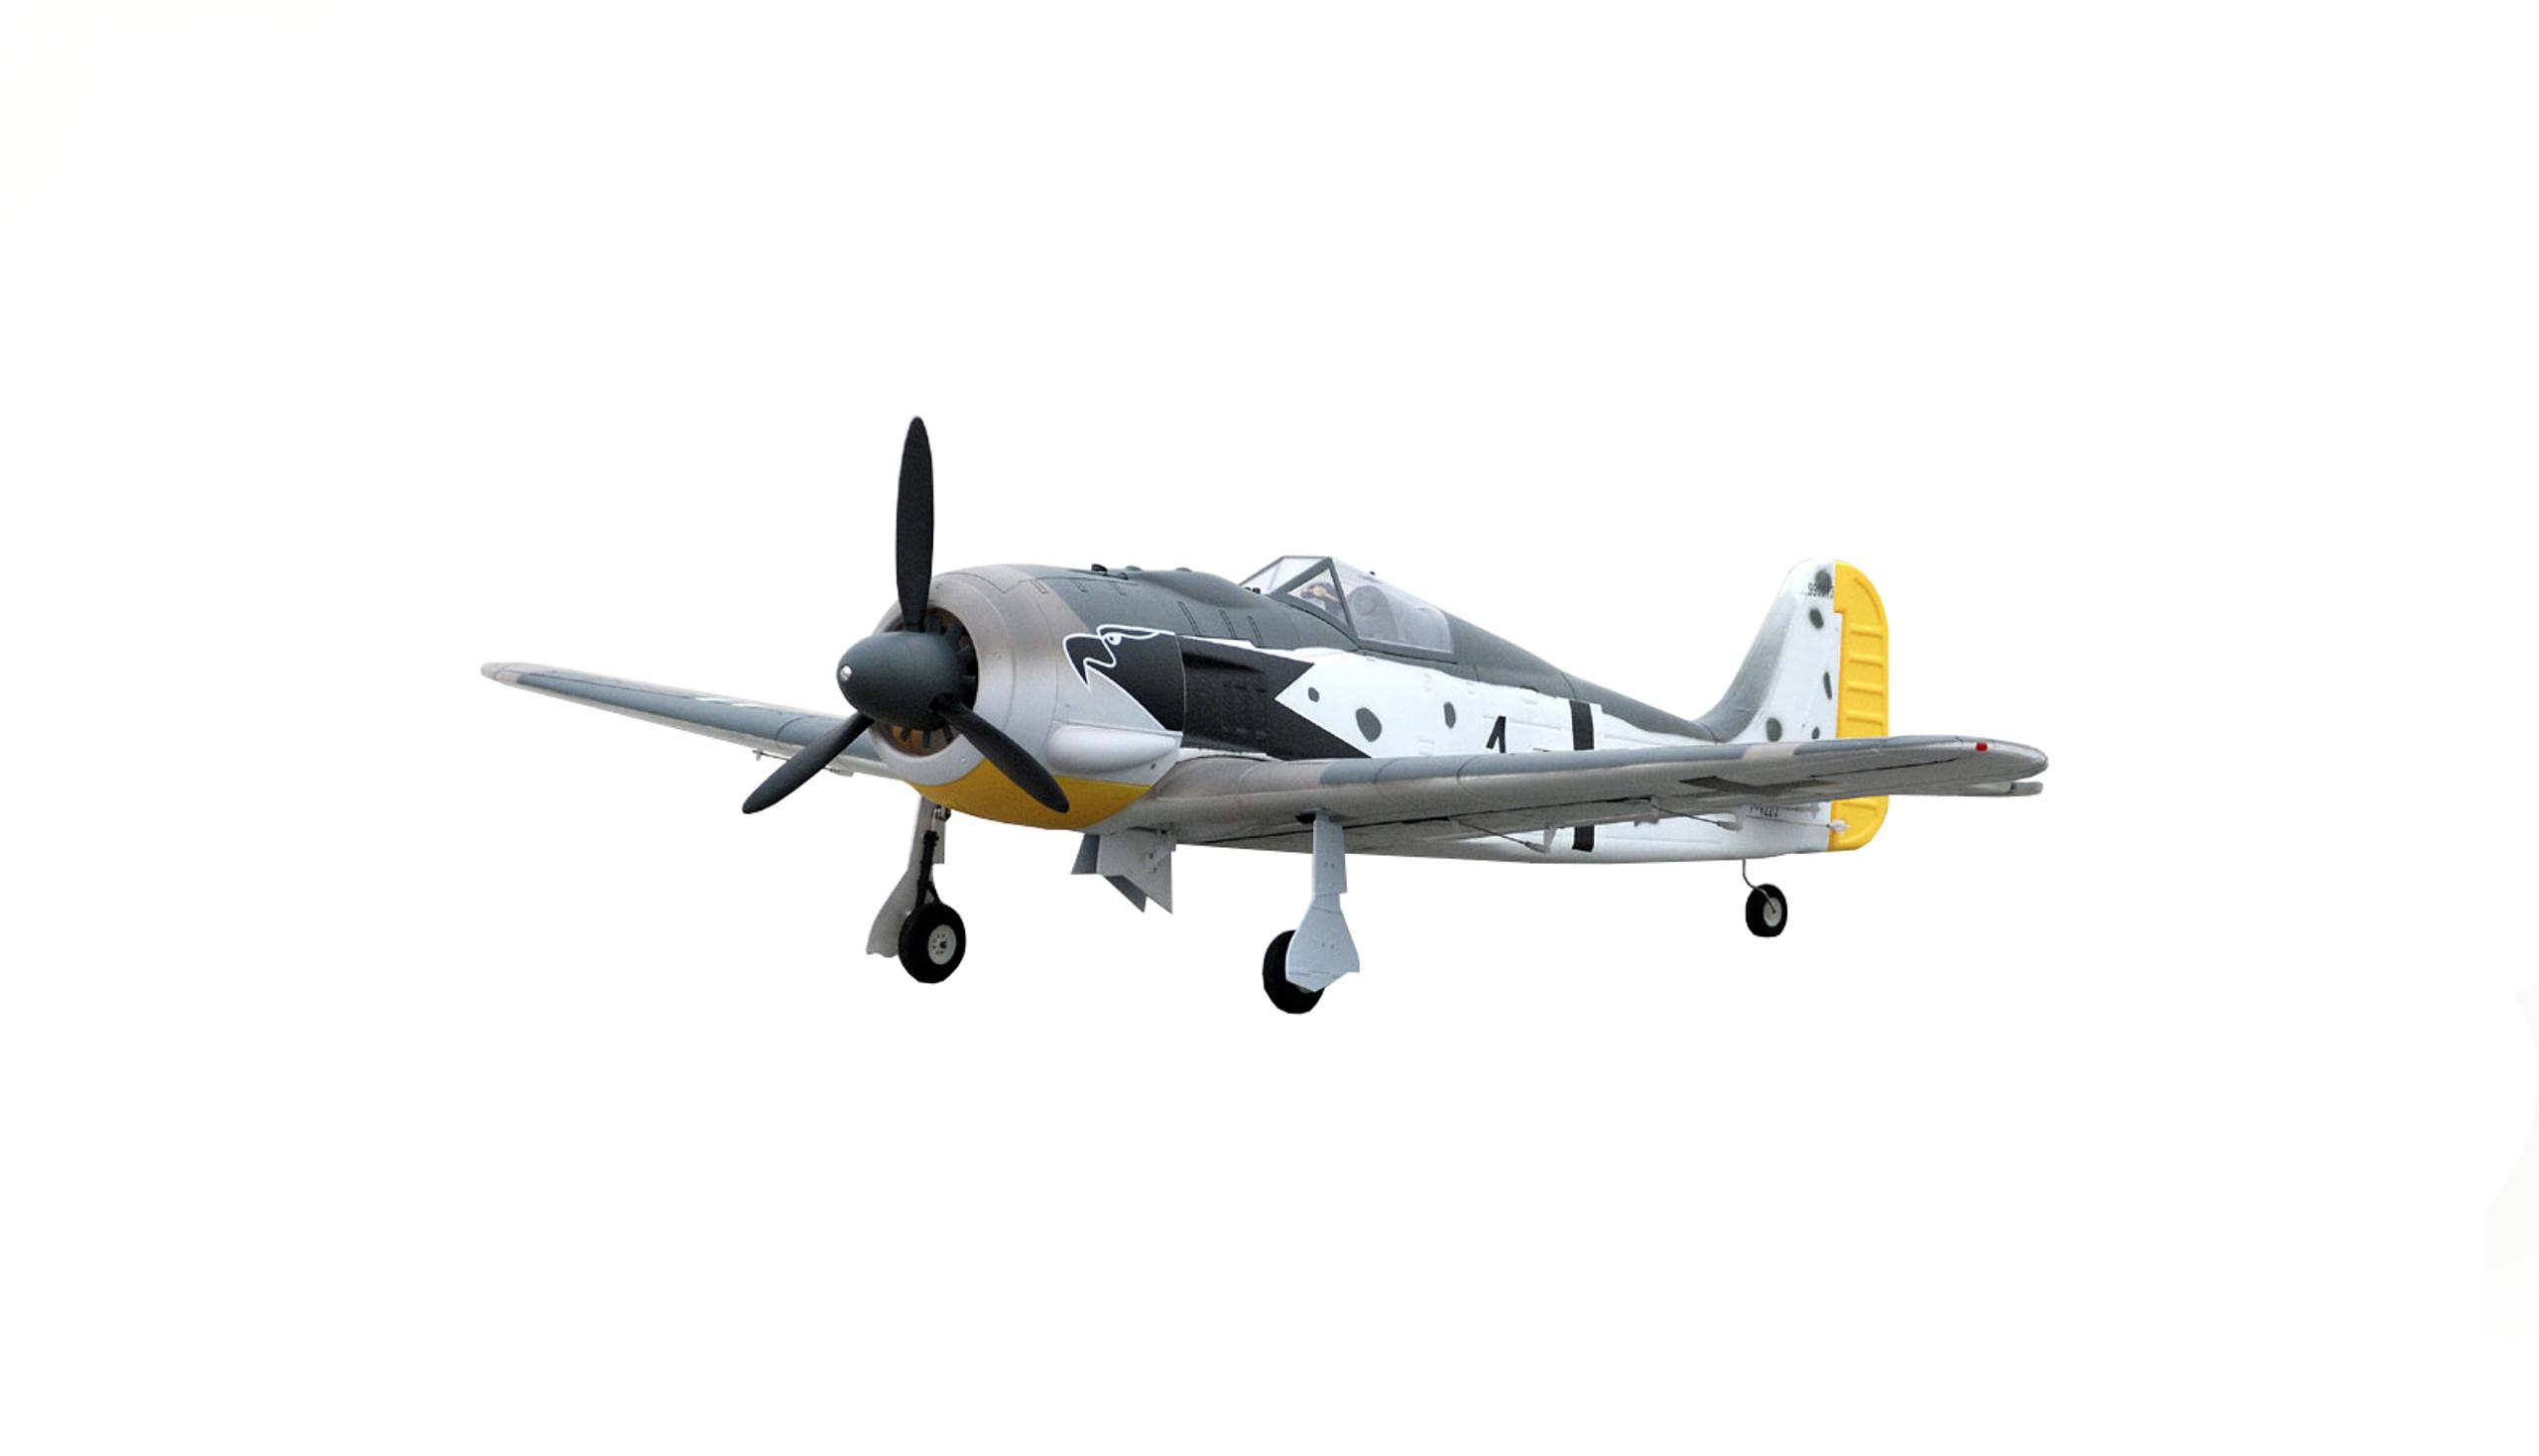 Amewi 24073 - Funkgesteuertes (RC) Kampfflugzeug - Plug-N-Play(PNP) - Mehrfarben - Elektromotor - 6 Kanäle - 9 g